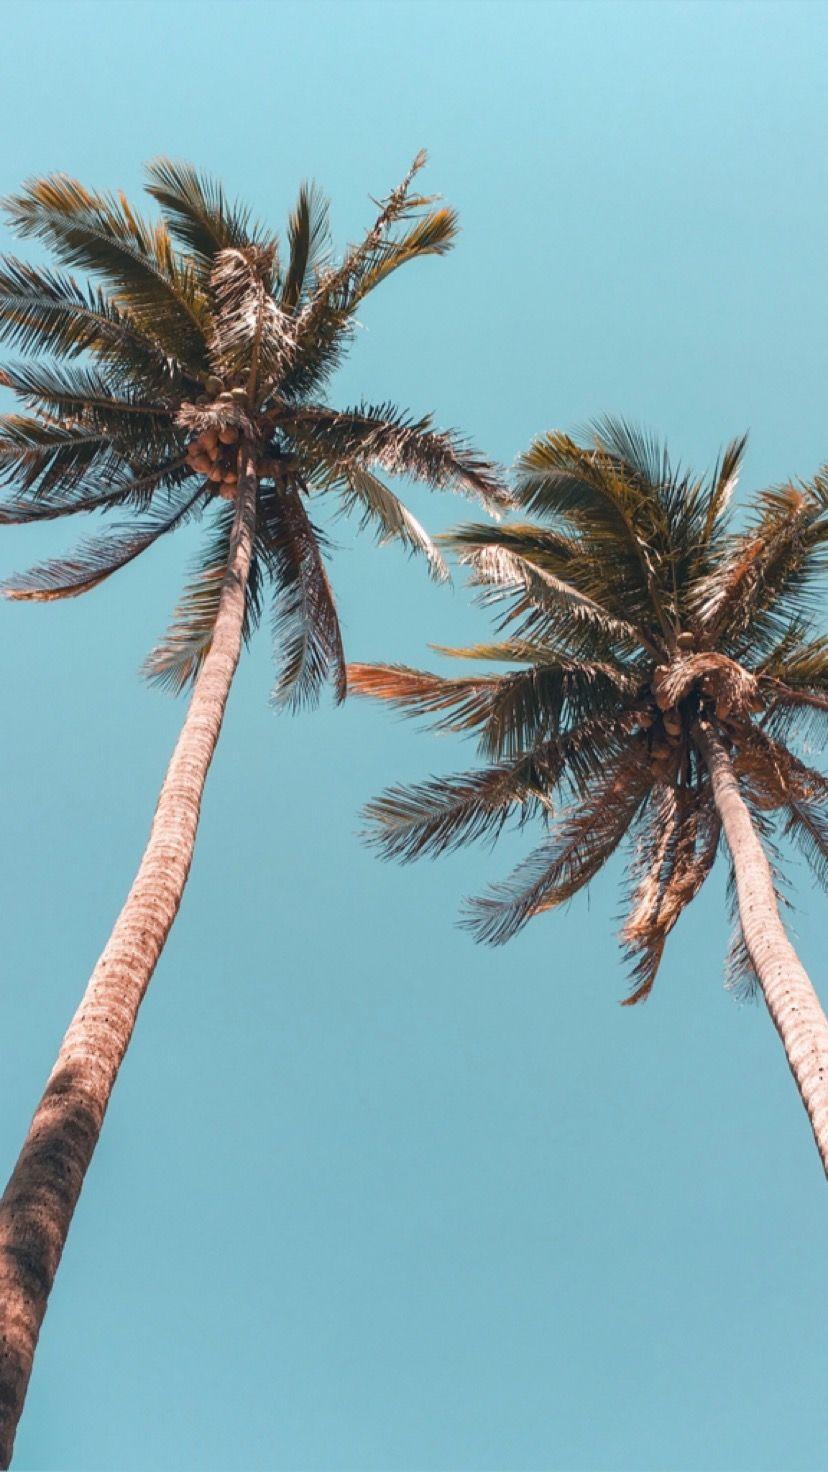 Tropical Palms Tree Wallpaper Iphone Palm Trees Wallpaper Tree Wallpaper Wallpaper palm trees on blue sky